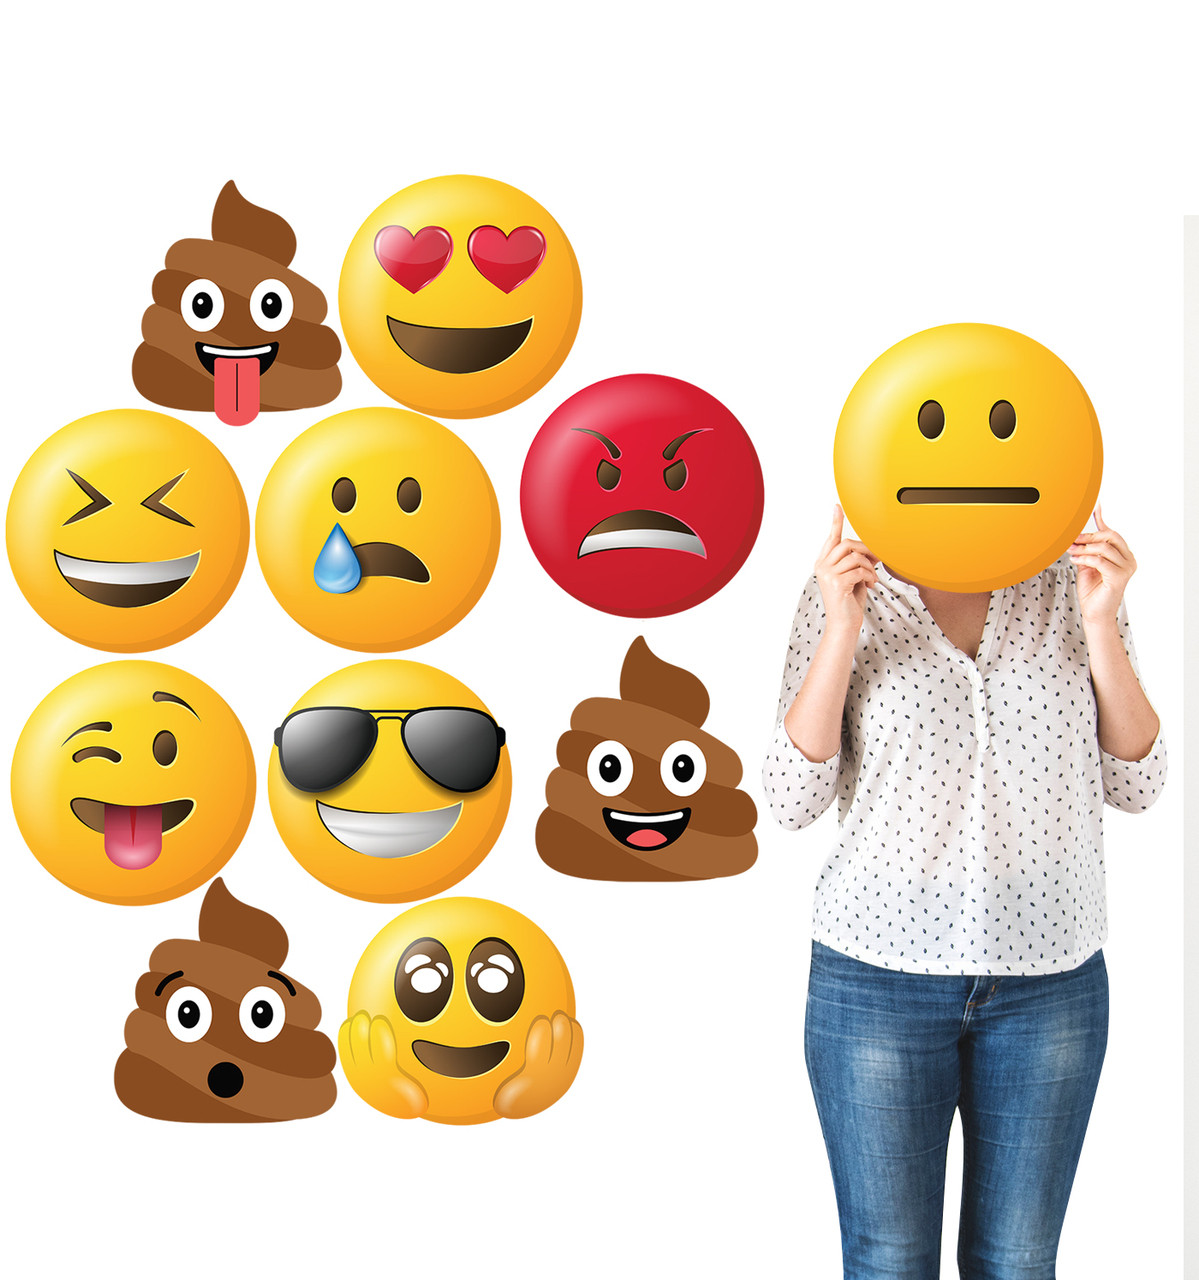 Cardboard Emoji Heads (Set of 11) with model.